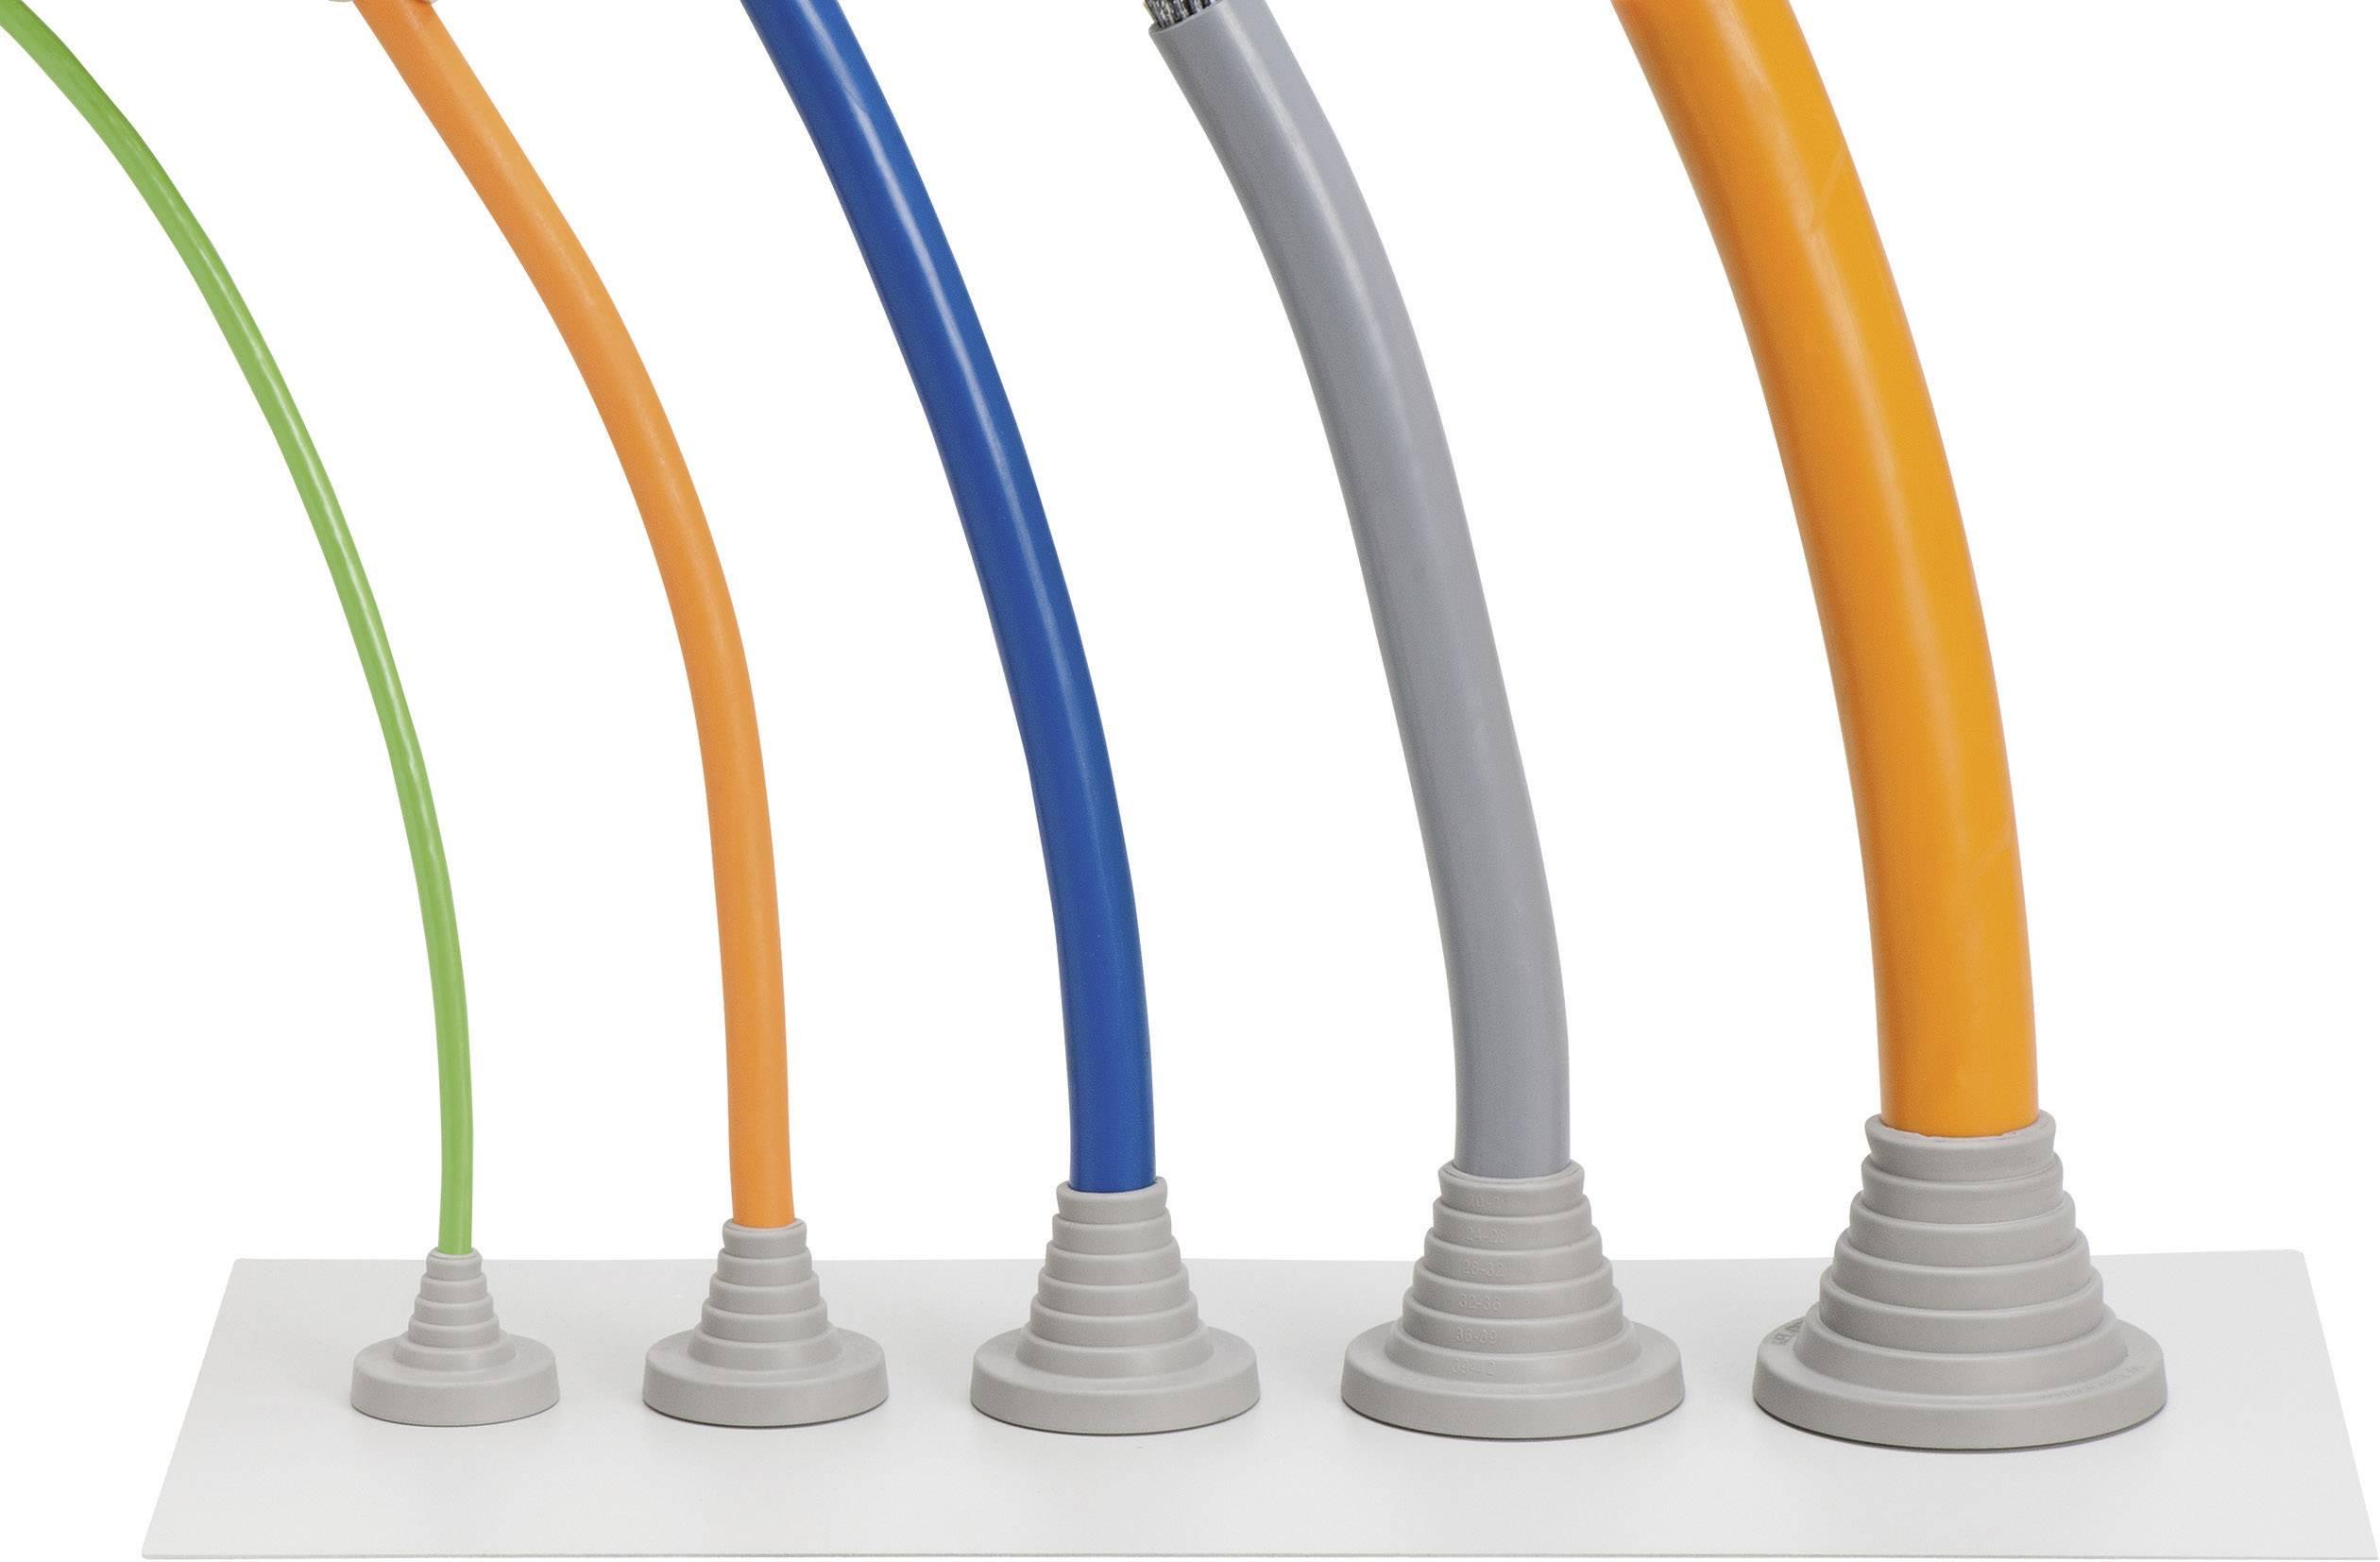 Icotek Uvodna kapa za kable KEL-DPF KEL-DPF 25/3-17 za kabel- 3 - 17 mm, velikost: M25 poliamid/elastomer, siva